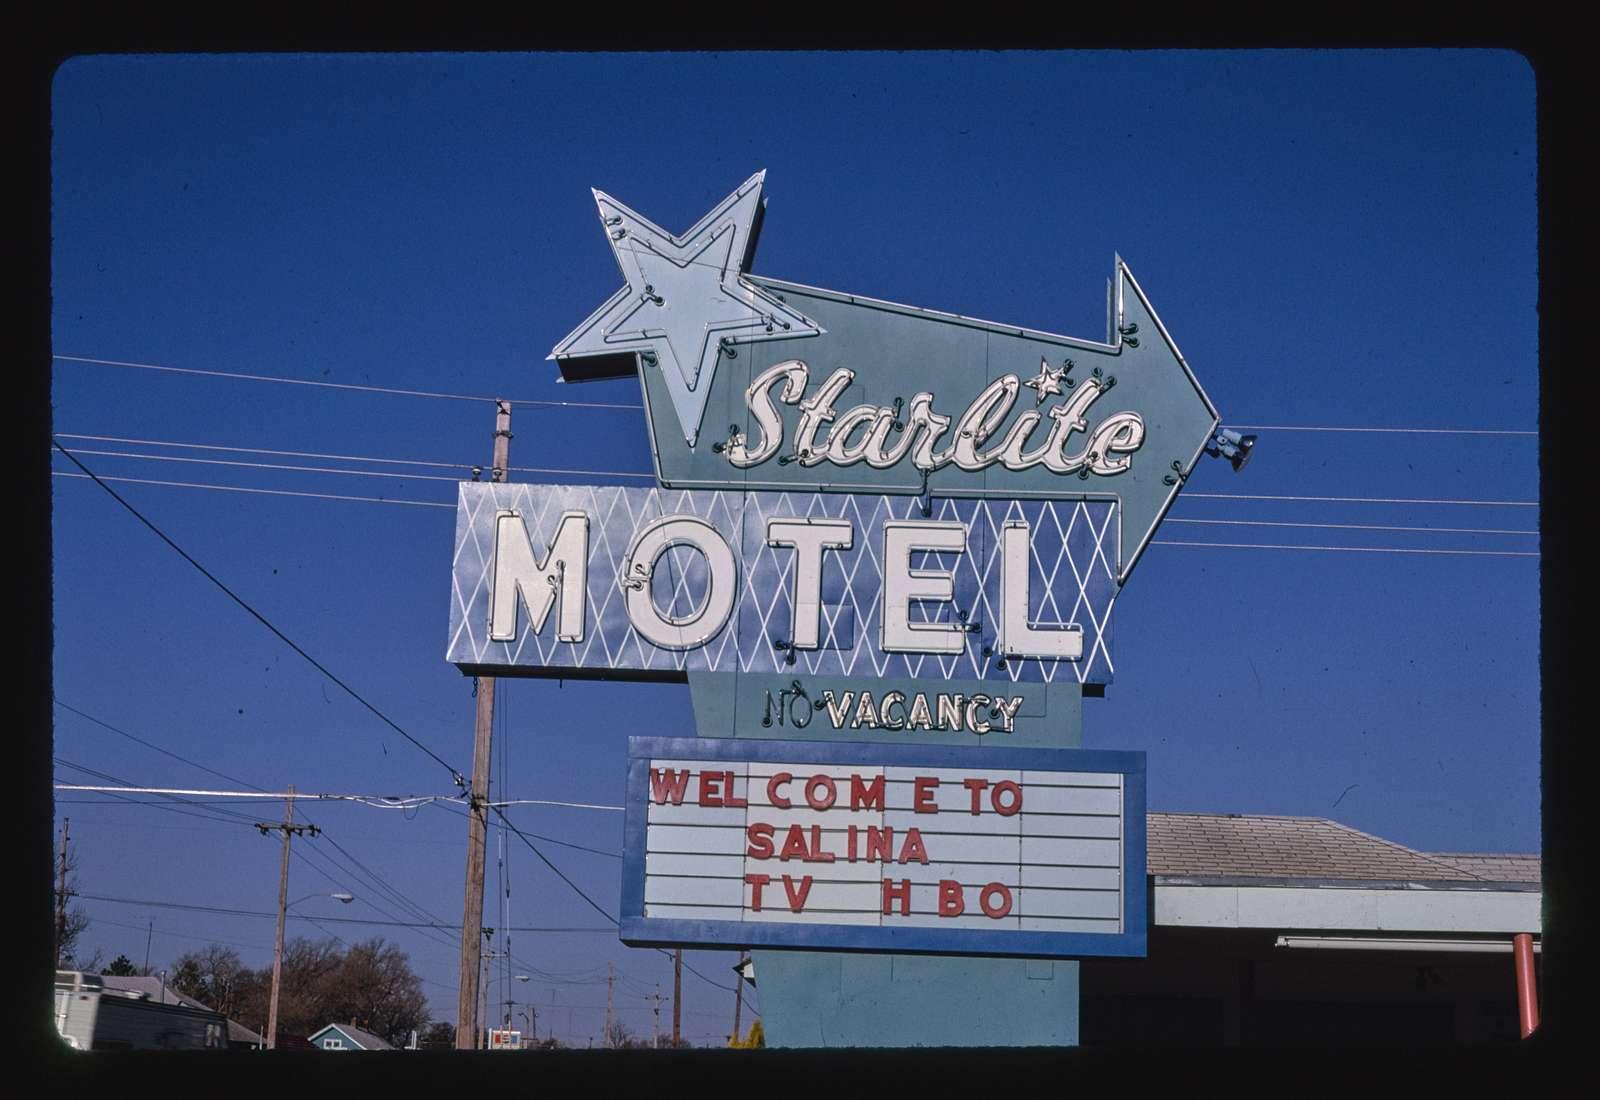 Starlite Motel sign, Route 40, Salina, Kansas